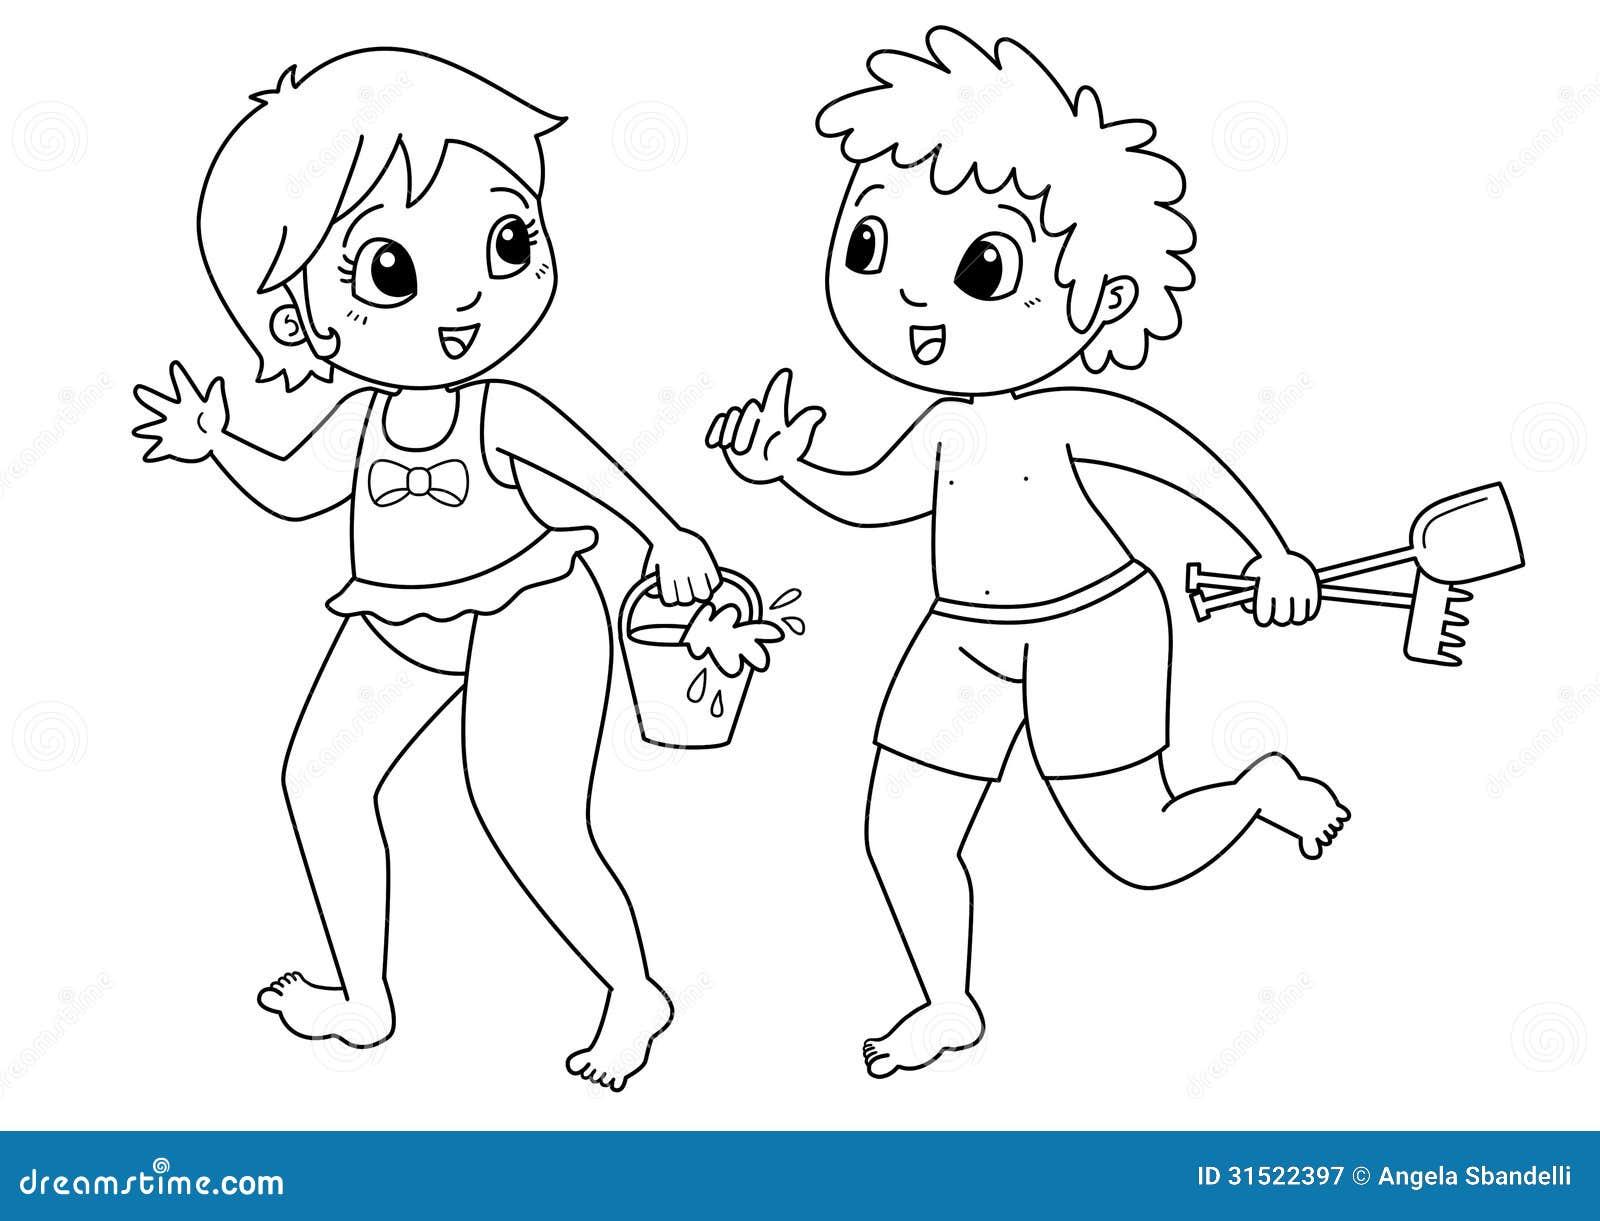 Plastilina Y Lápiz 20 De Noviembre Día De Los Derechos: Crianças Que Tiram Para Colorir Ilustração Stock